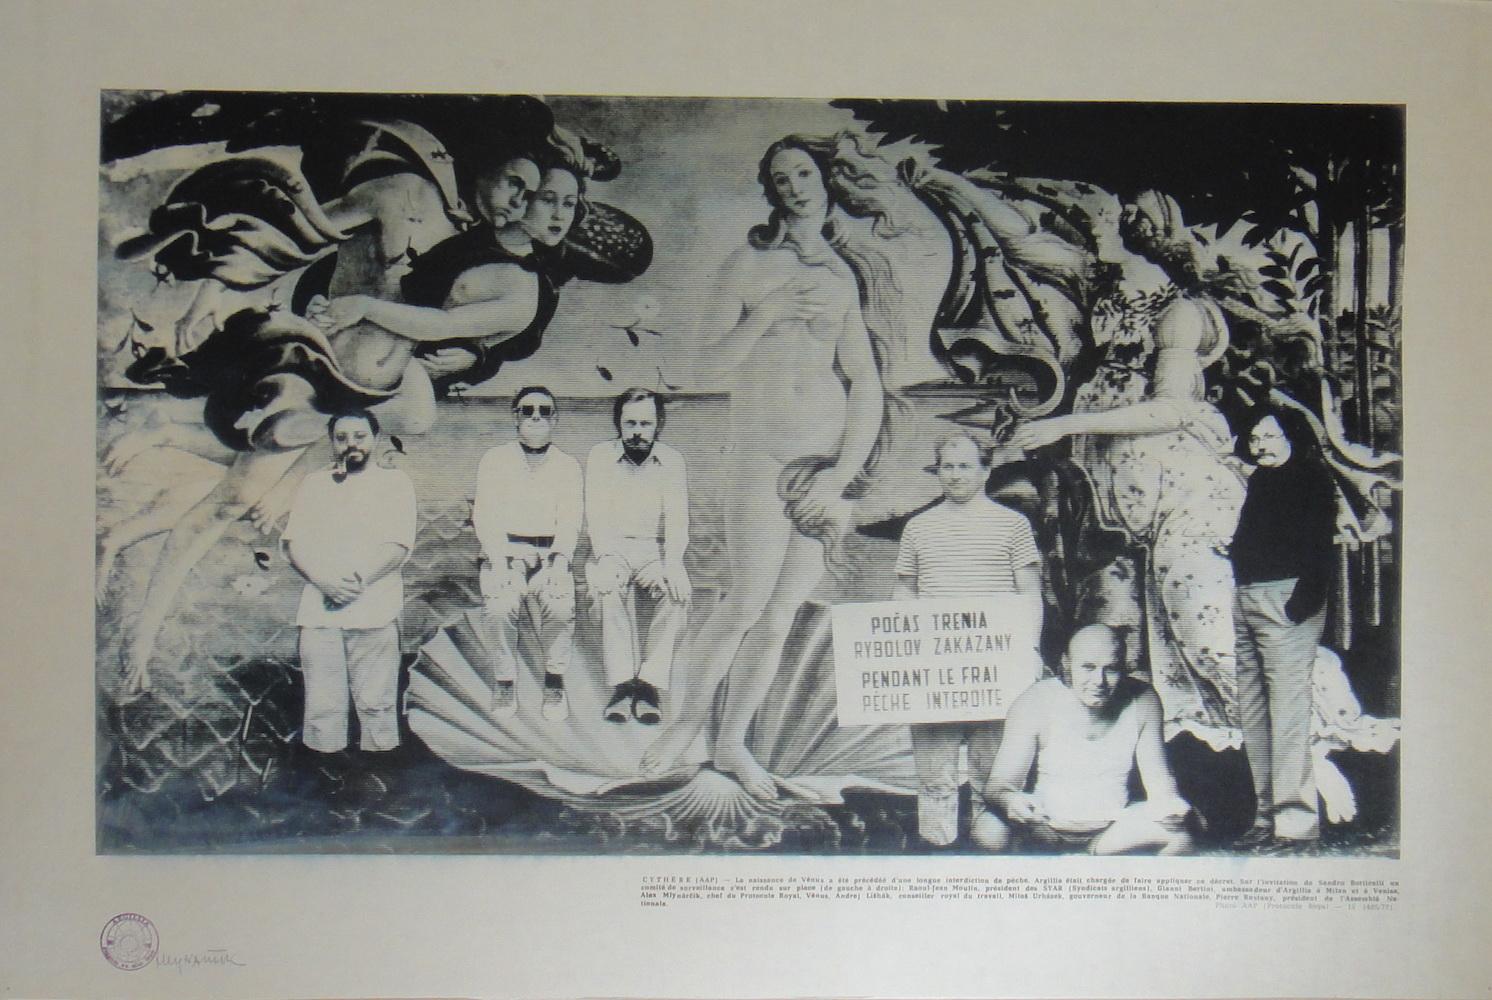 1978, Cythére, Argillia, tlač na plátne, 61,5x93 cm